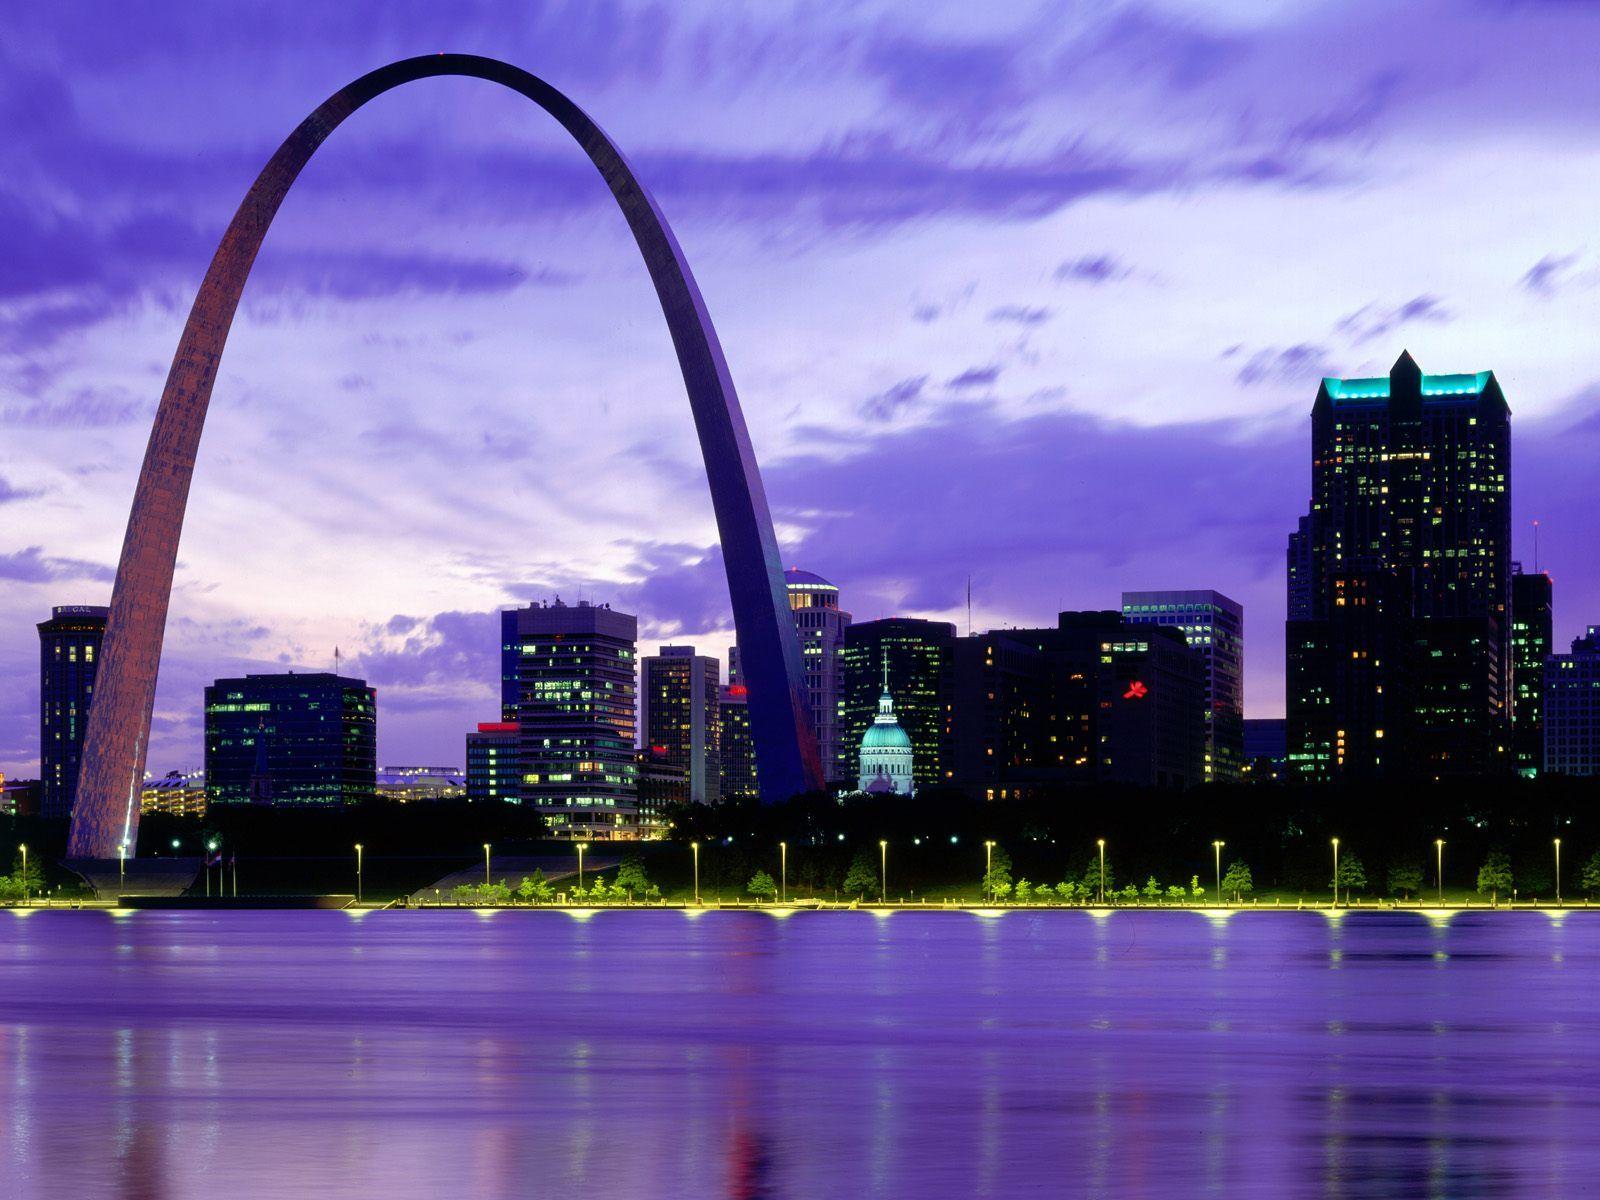 St Louis Missouri postcard Meet Me in St Louis Missouri wallpaper 1600x1200